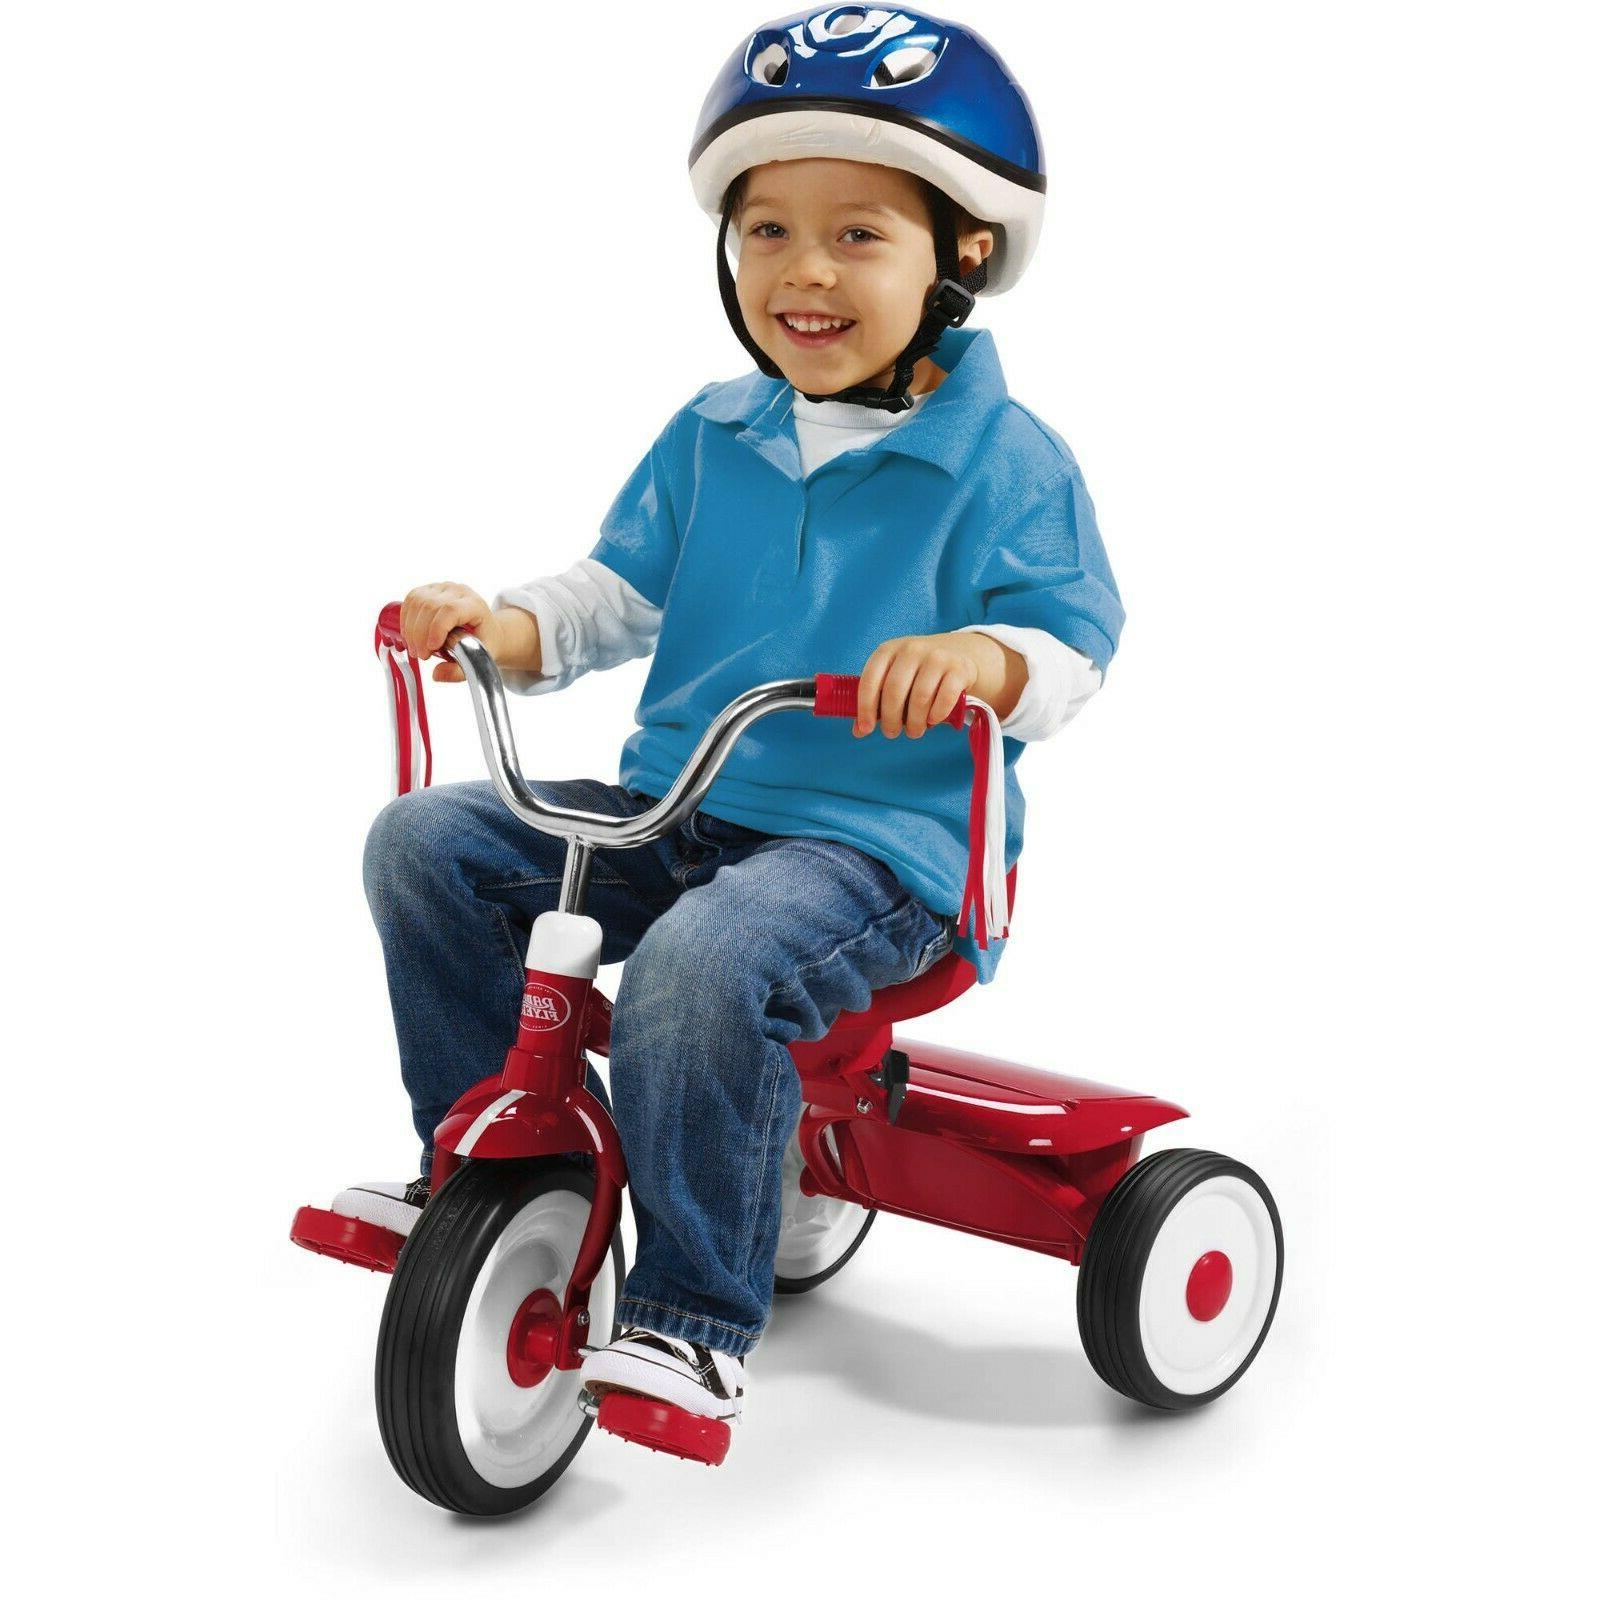 Folding Trike Red Kids Ride On Toy Garden